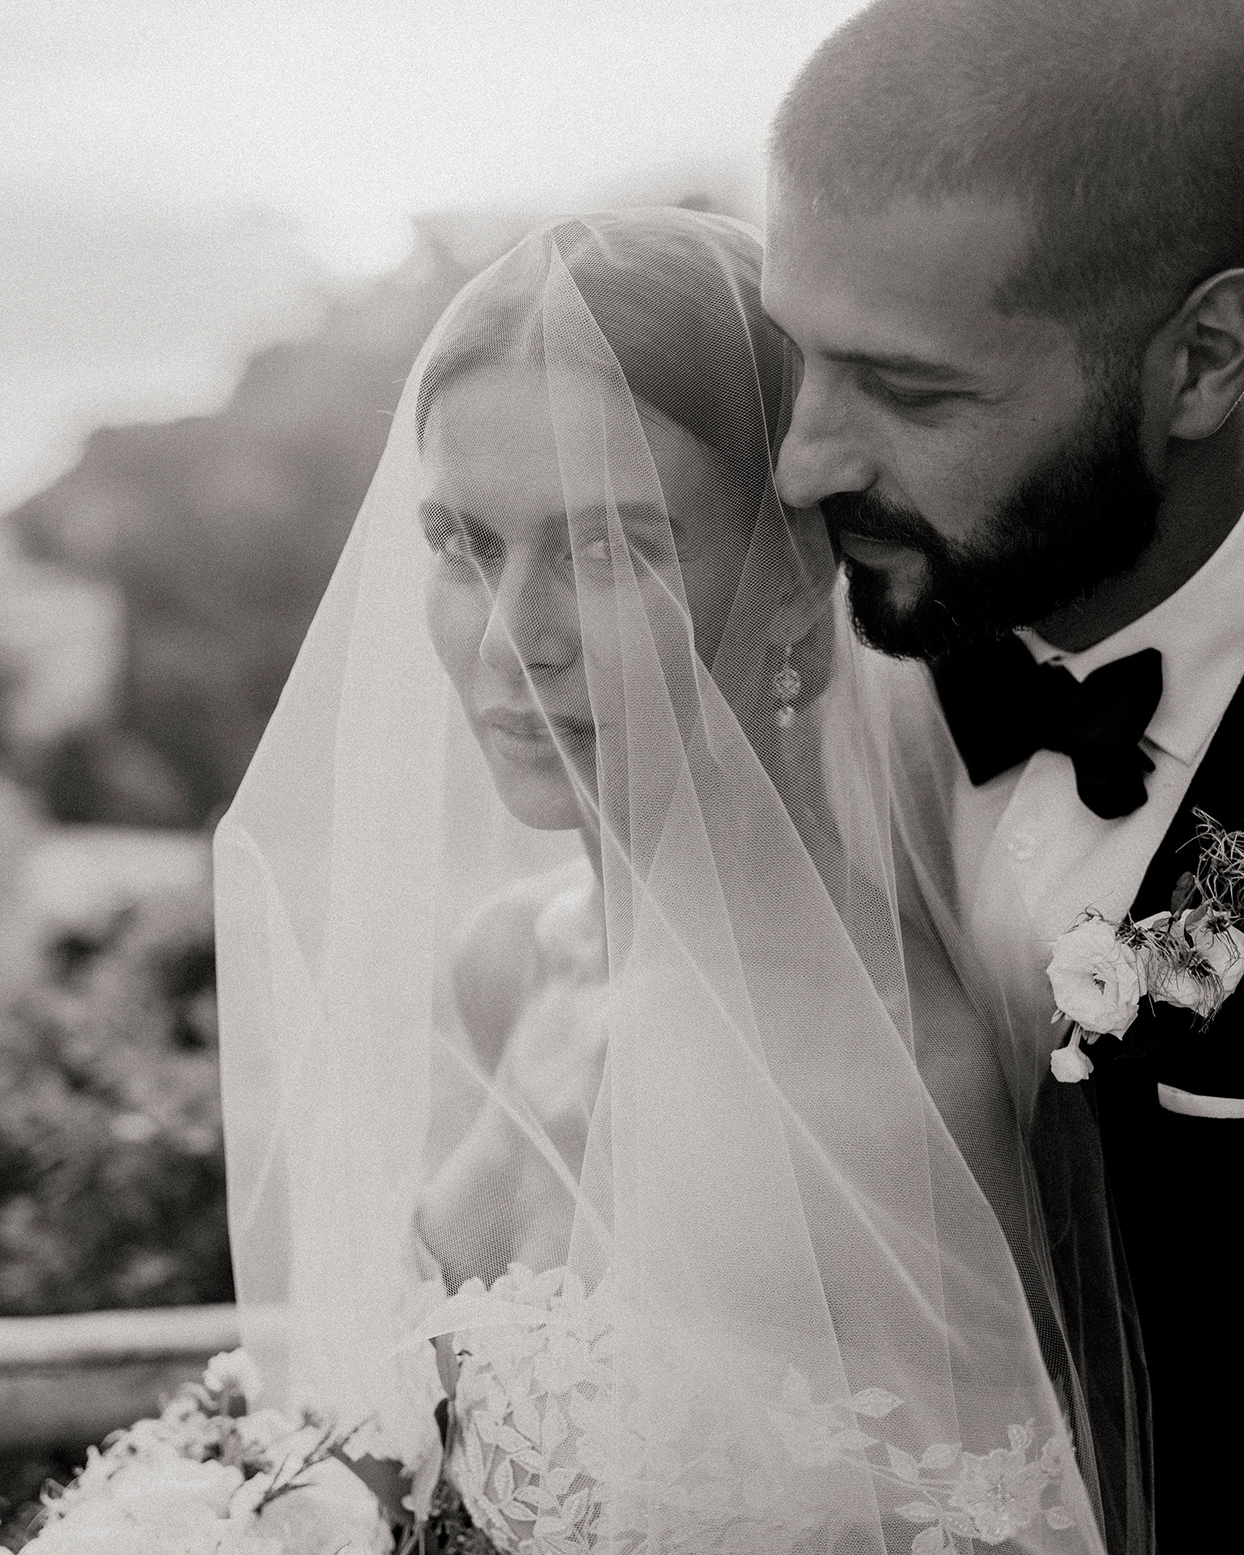 jaclyn antonio wedding bride and groom black and white